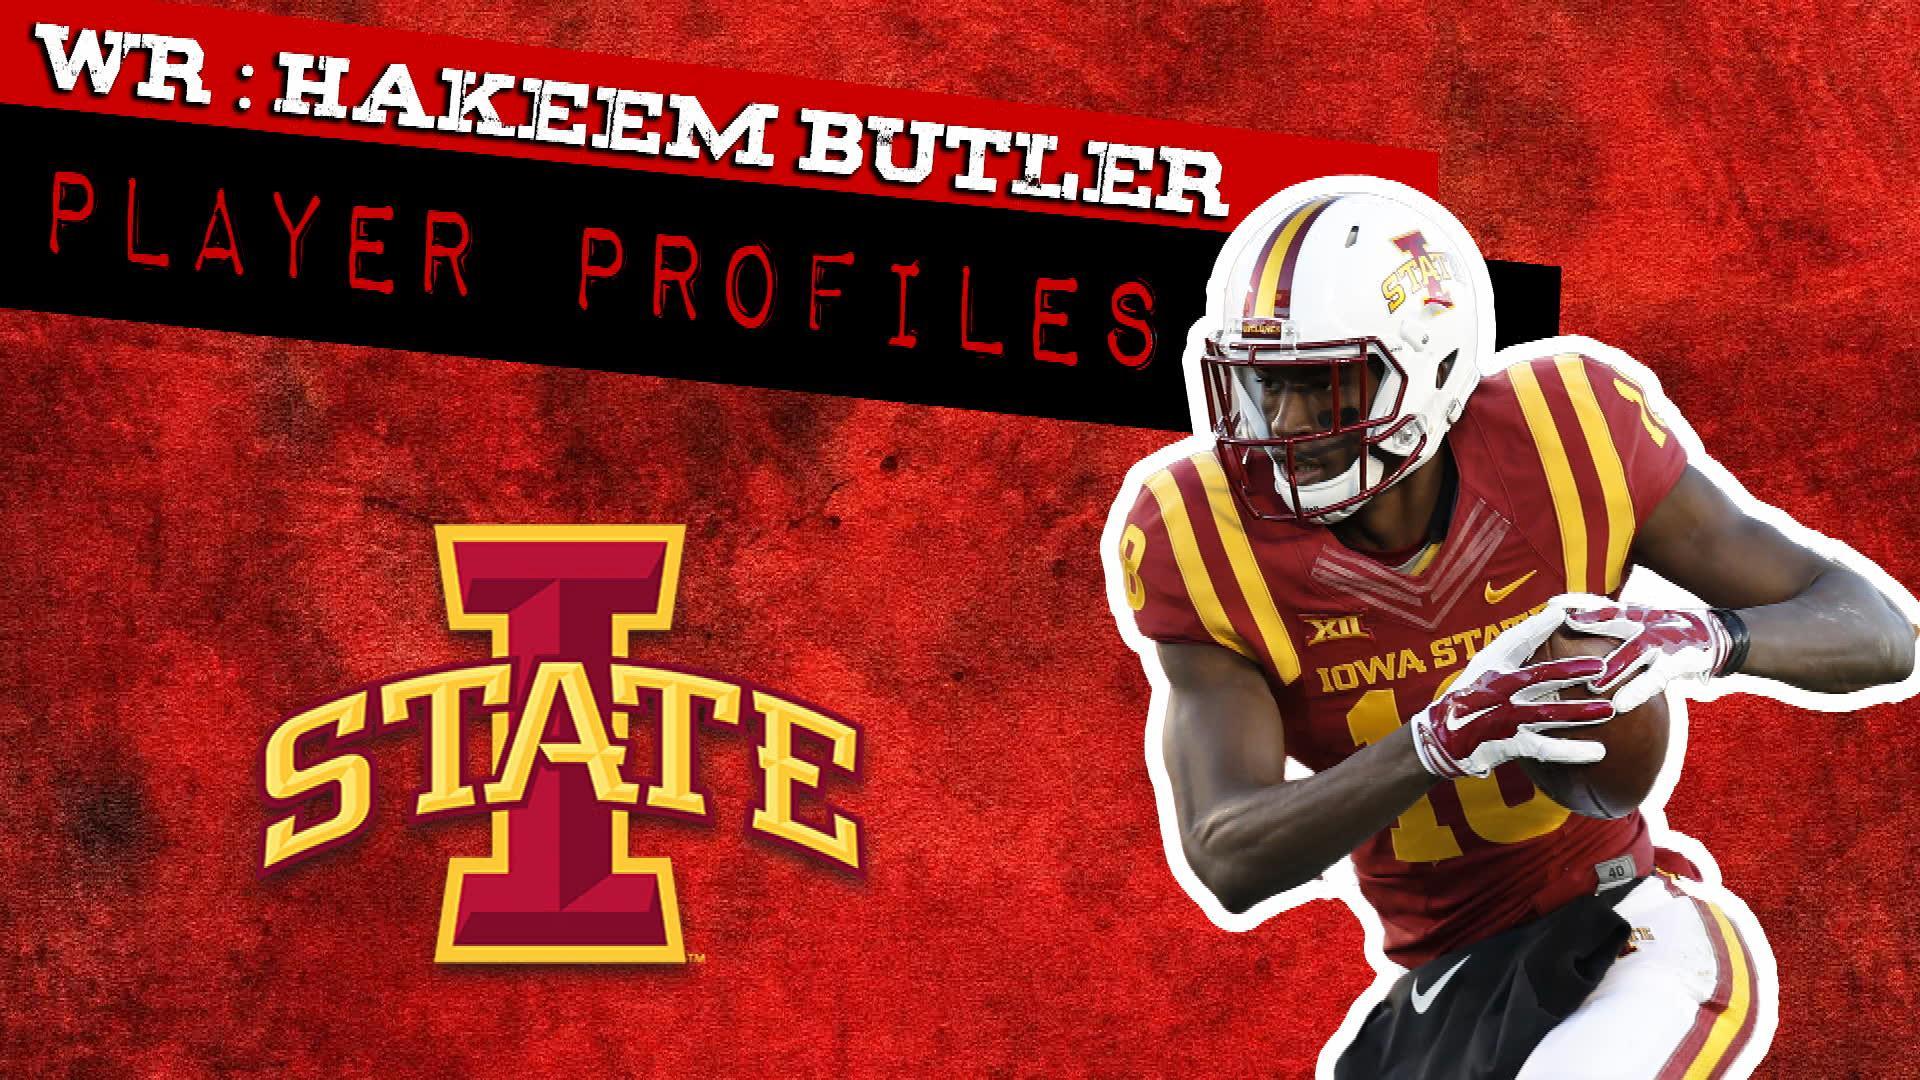 2019 NFL Draft profile: Hakeem Butler, Iowa State